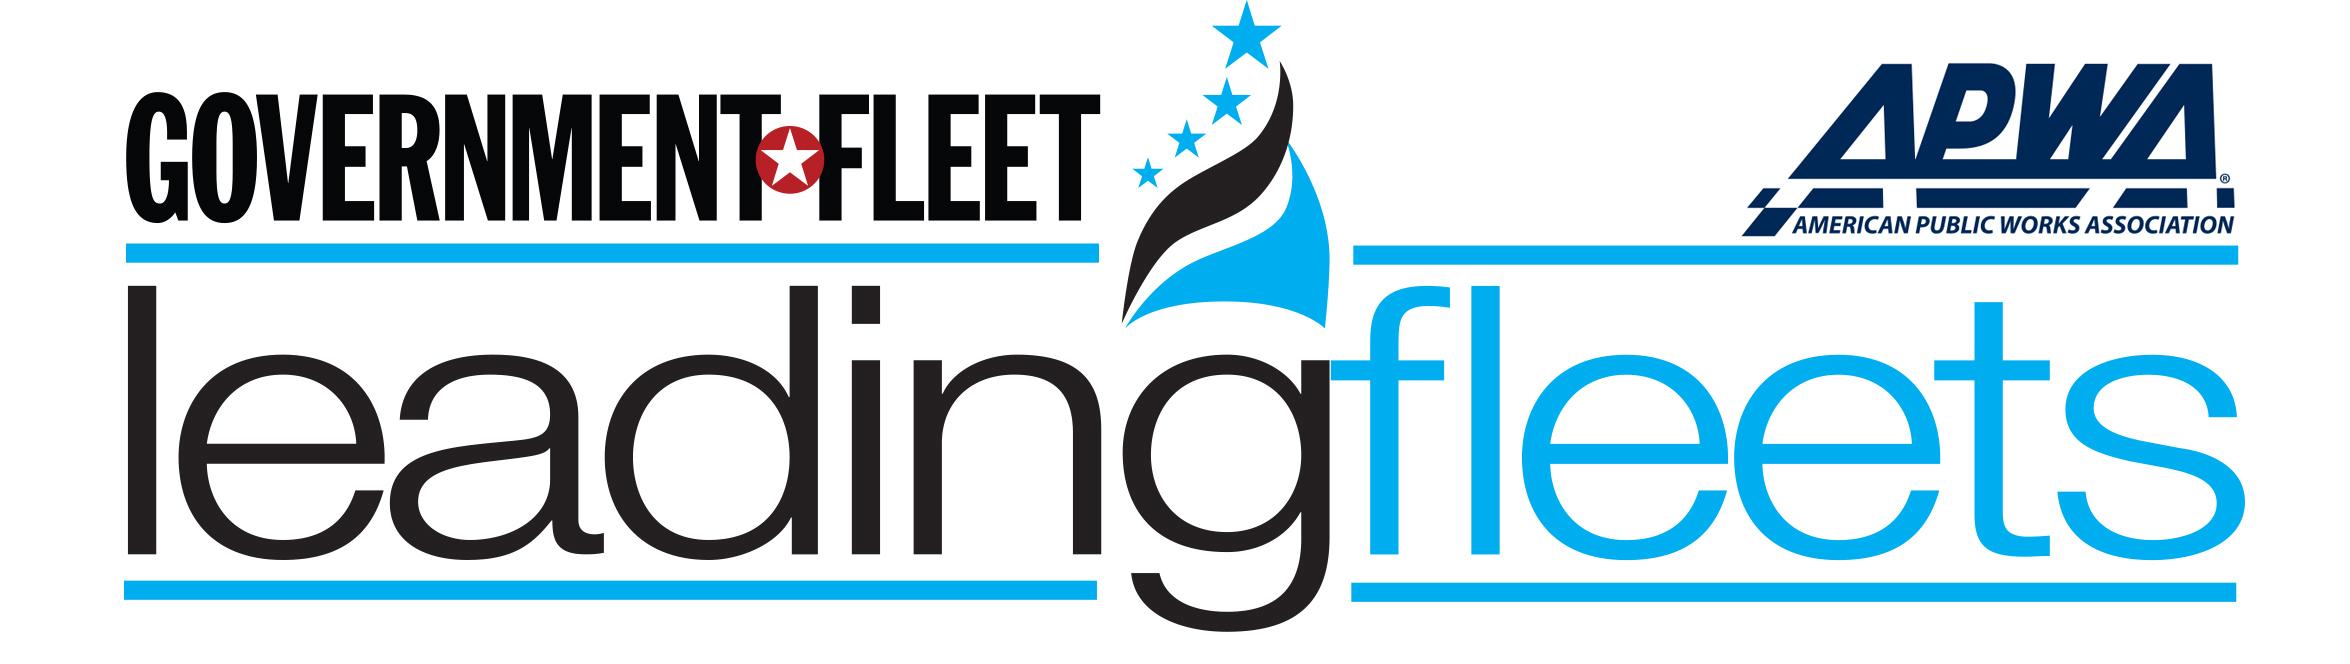 Leading Fleets Assets - Government Fleet